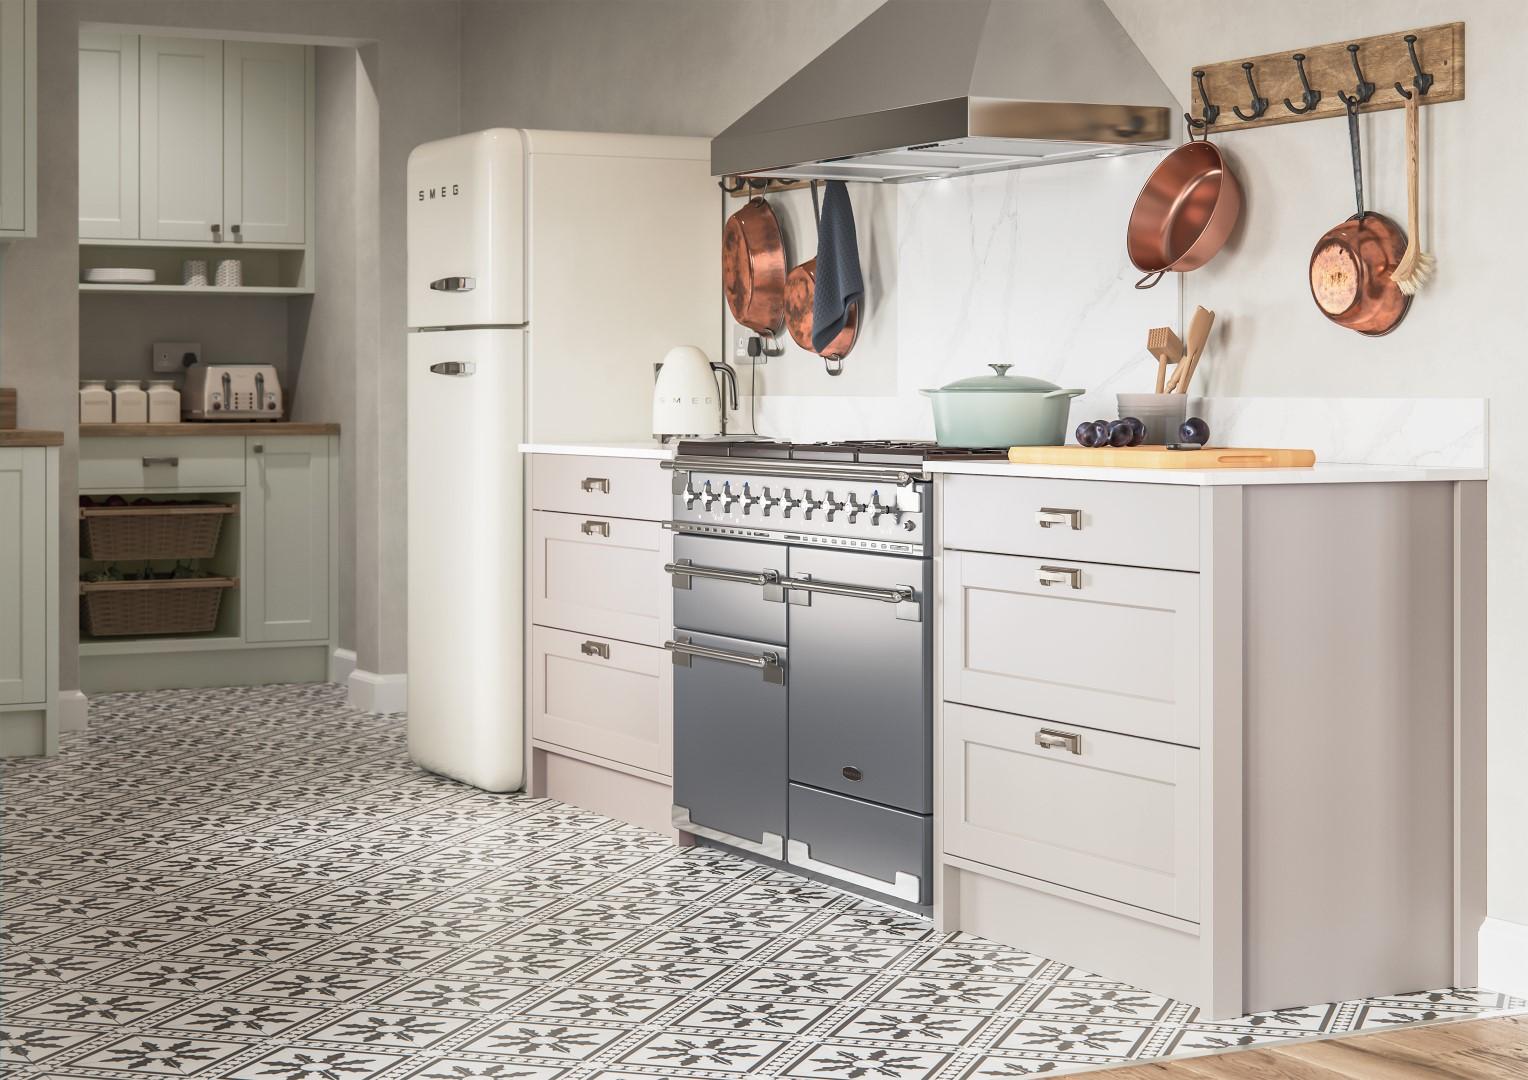 Dawson Porcelain and Cashmere - Kitchen Design - Alan Kelly Kitchens - Waterford - 3